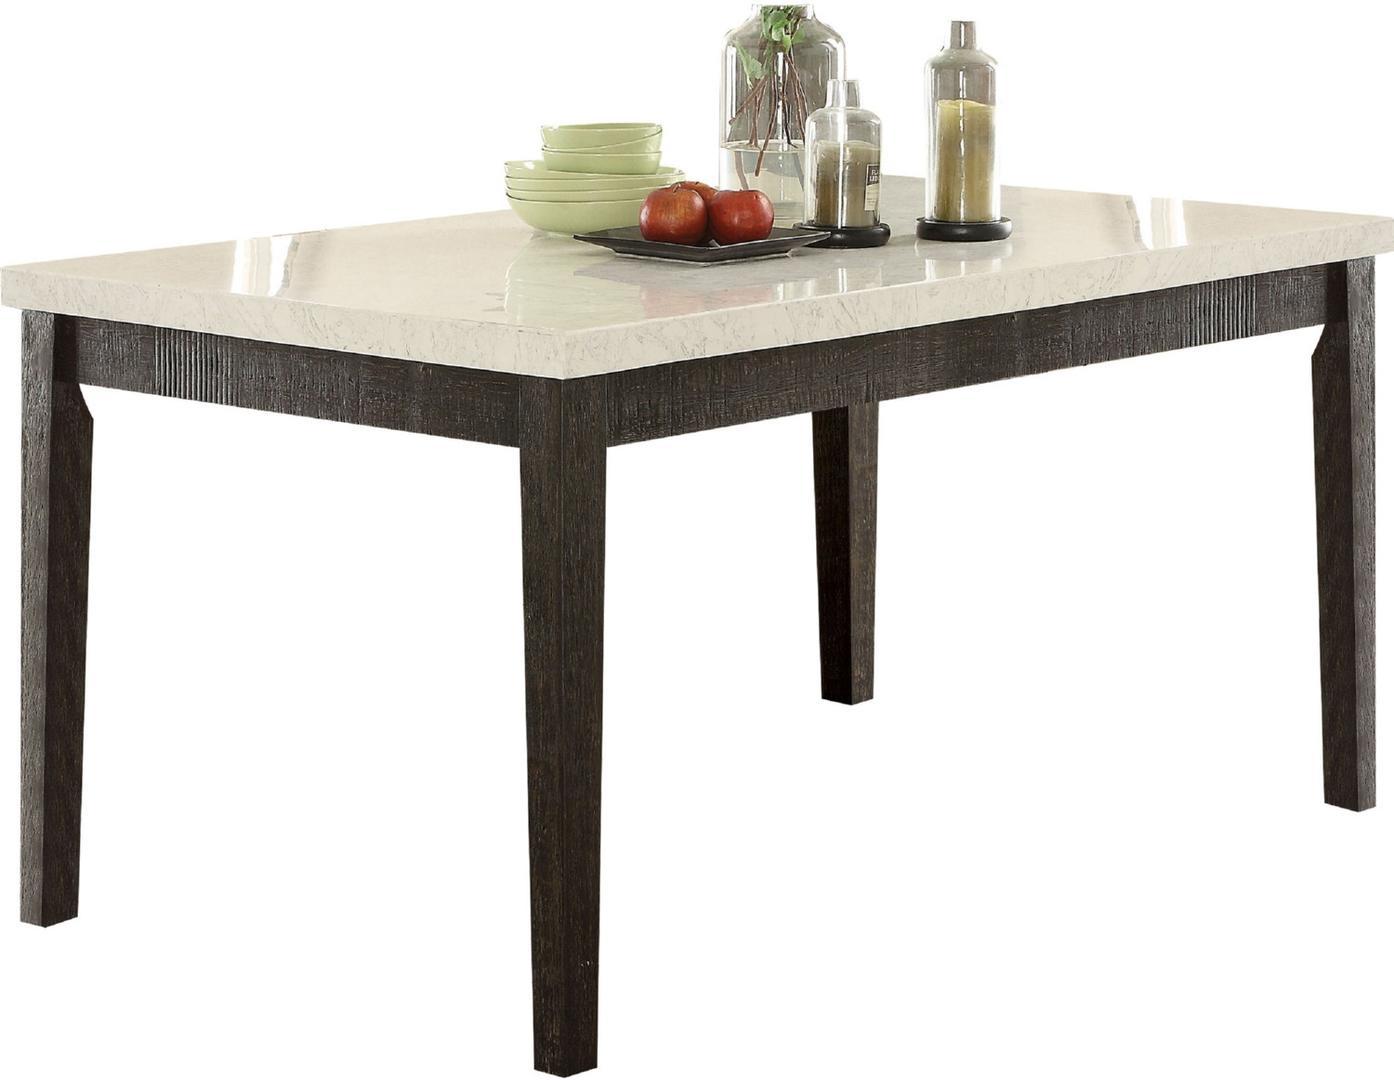 Acme 72850-52 7 pc Nolan white marble top salvaged dark oak finish wood dining table set